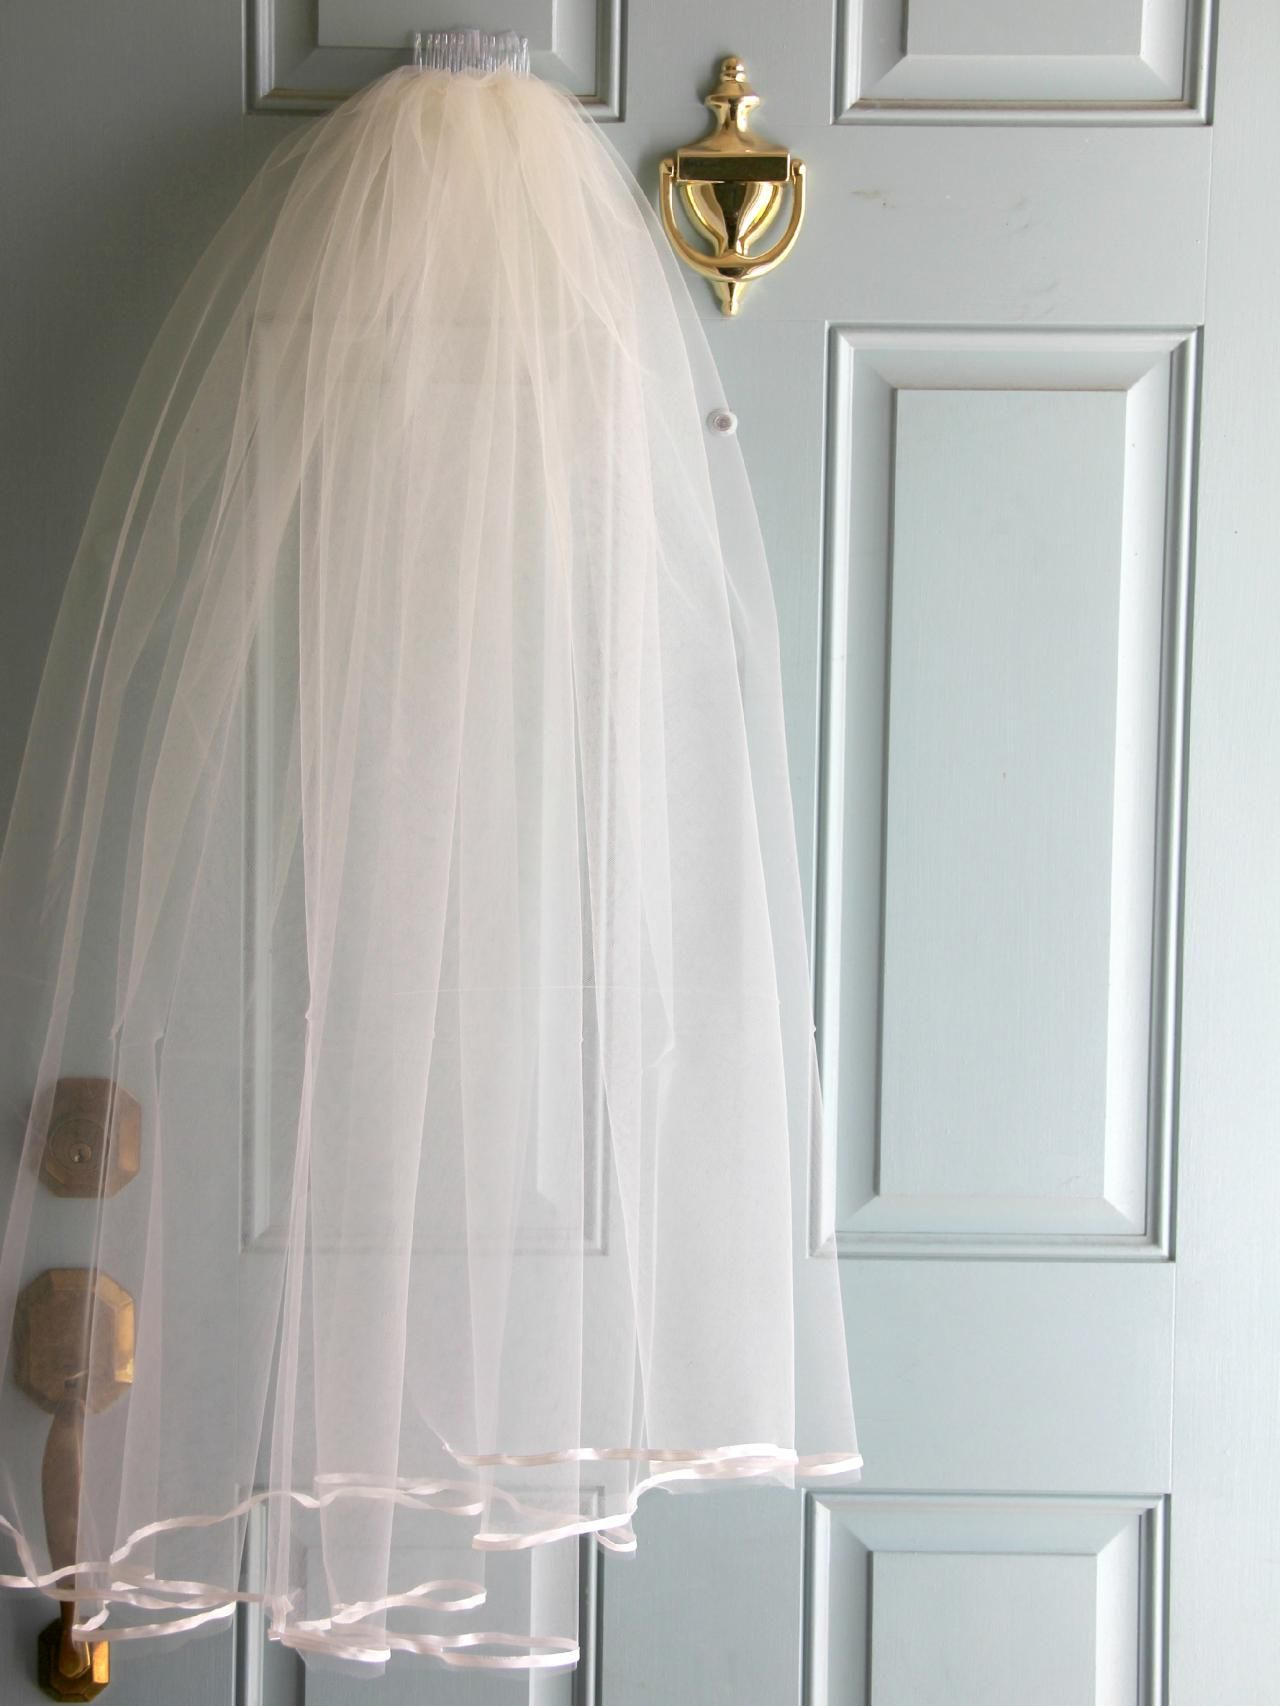 How to make a classic wedding veil diy wedding veil